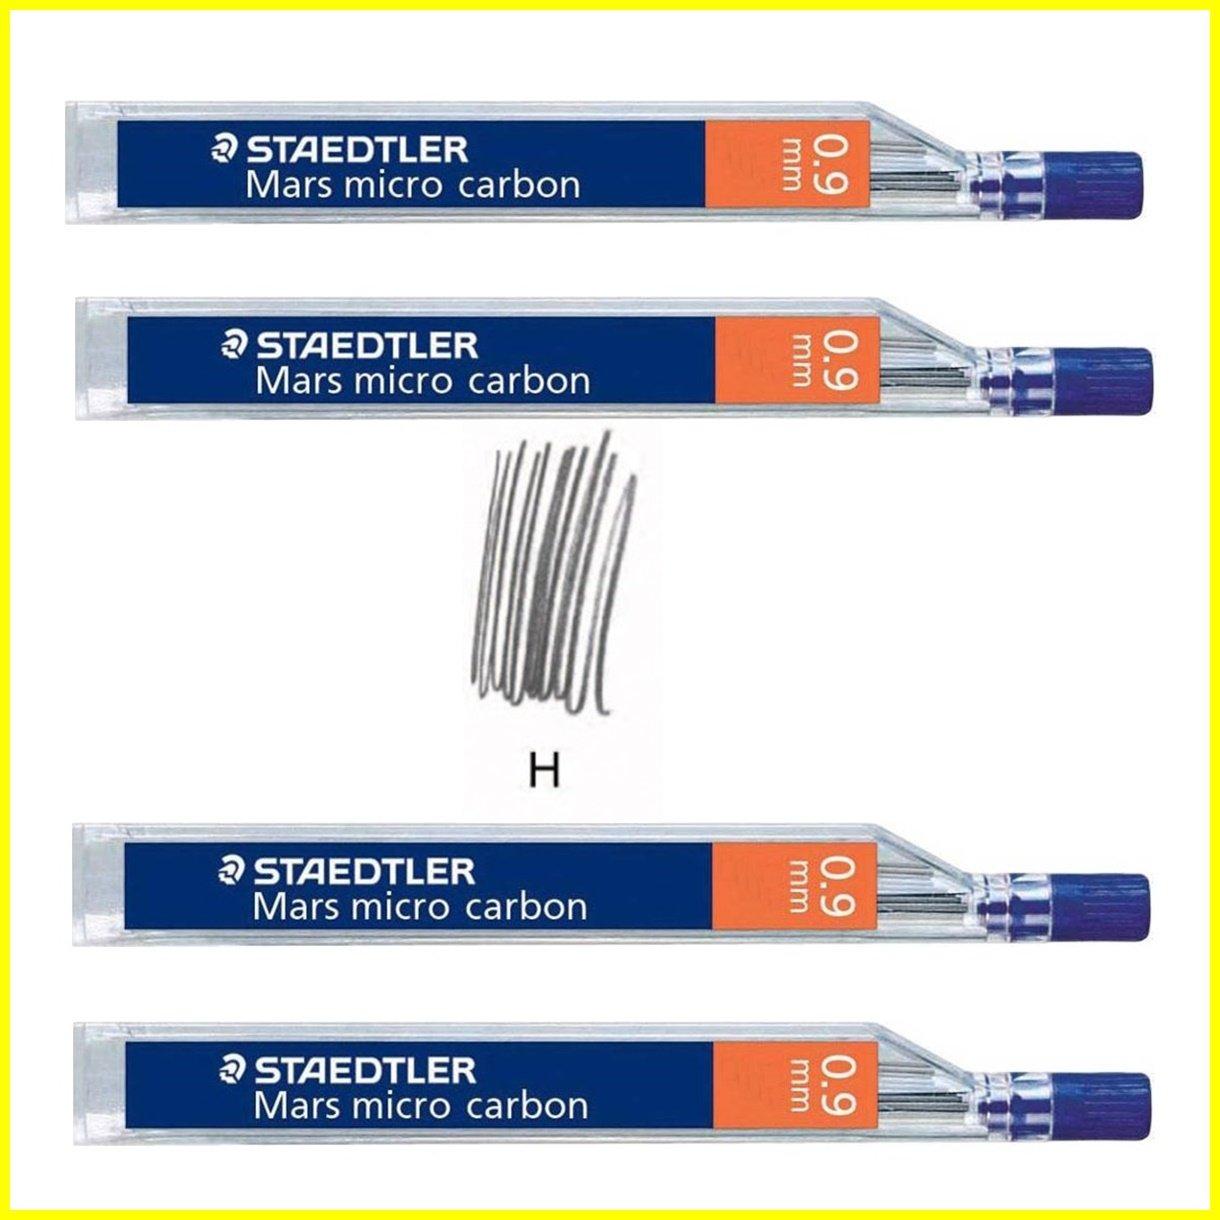 STAEDTLER Mars Micro Carbon 250 0.9mm H - Pencil Lead Refills - 4 Tubes/Packs (48 Leads) HB